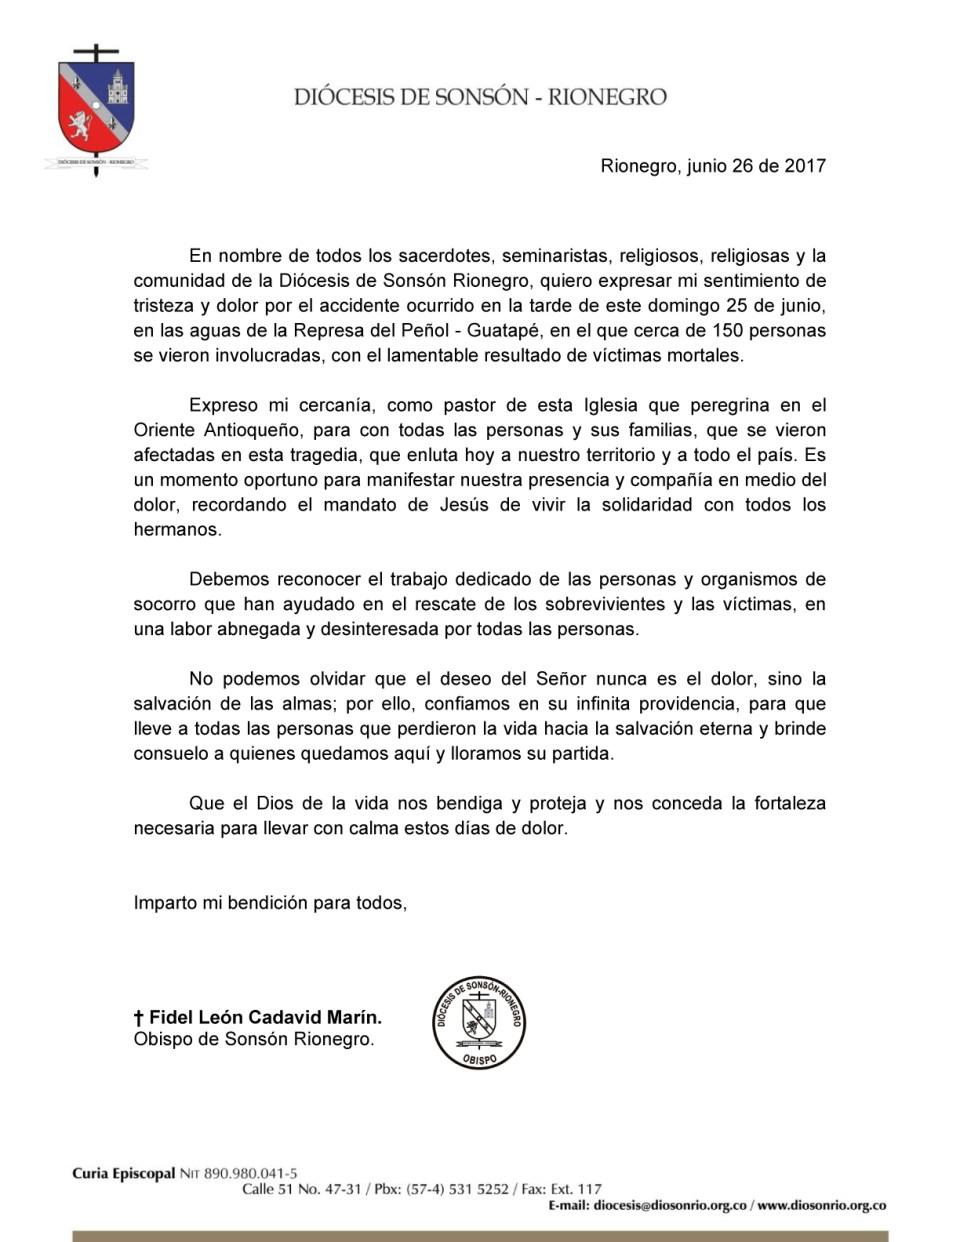 Mensaje del Obispo - Tragedia en Guatapé